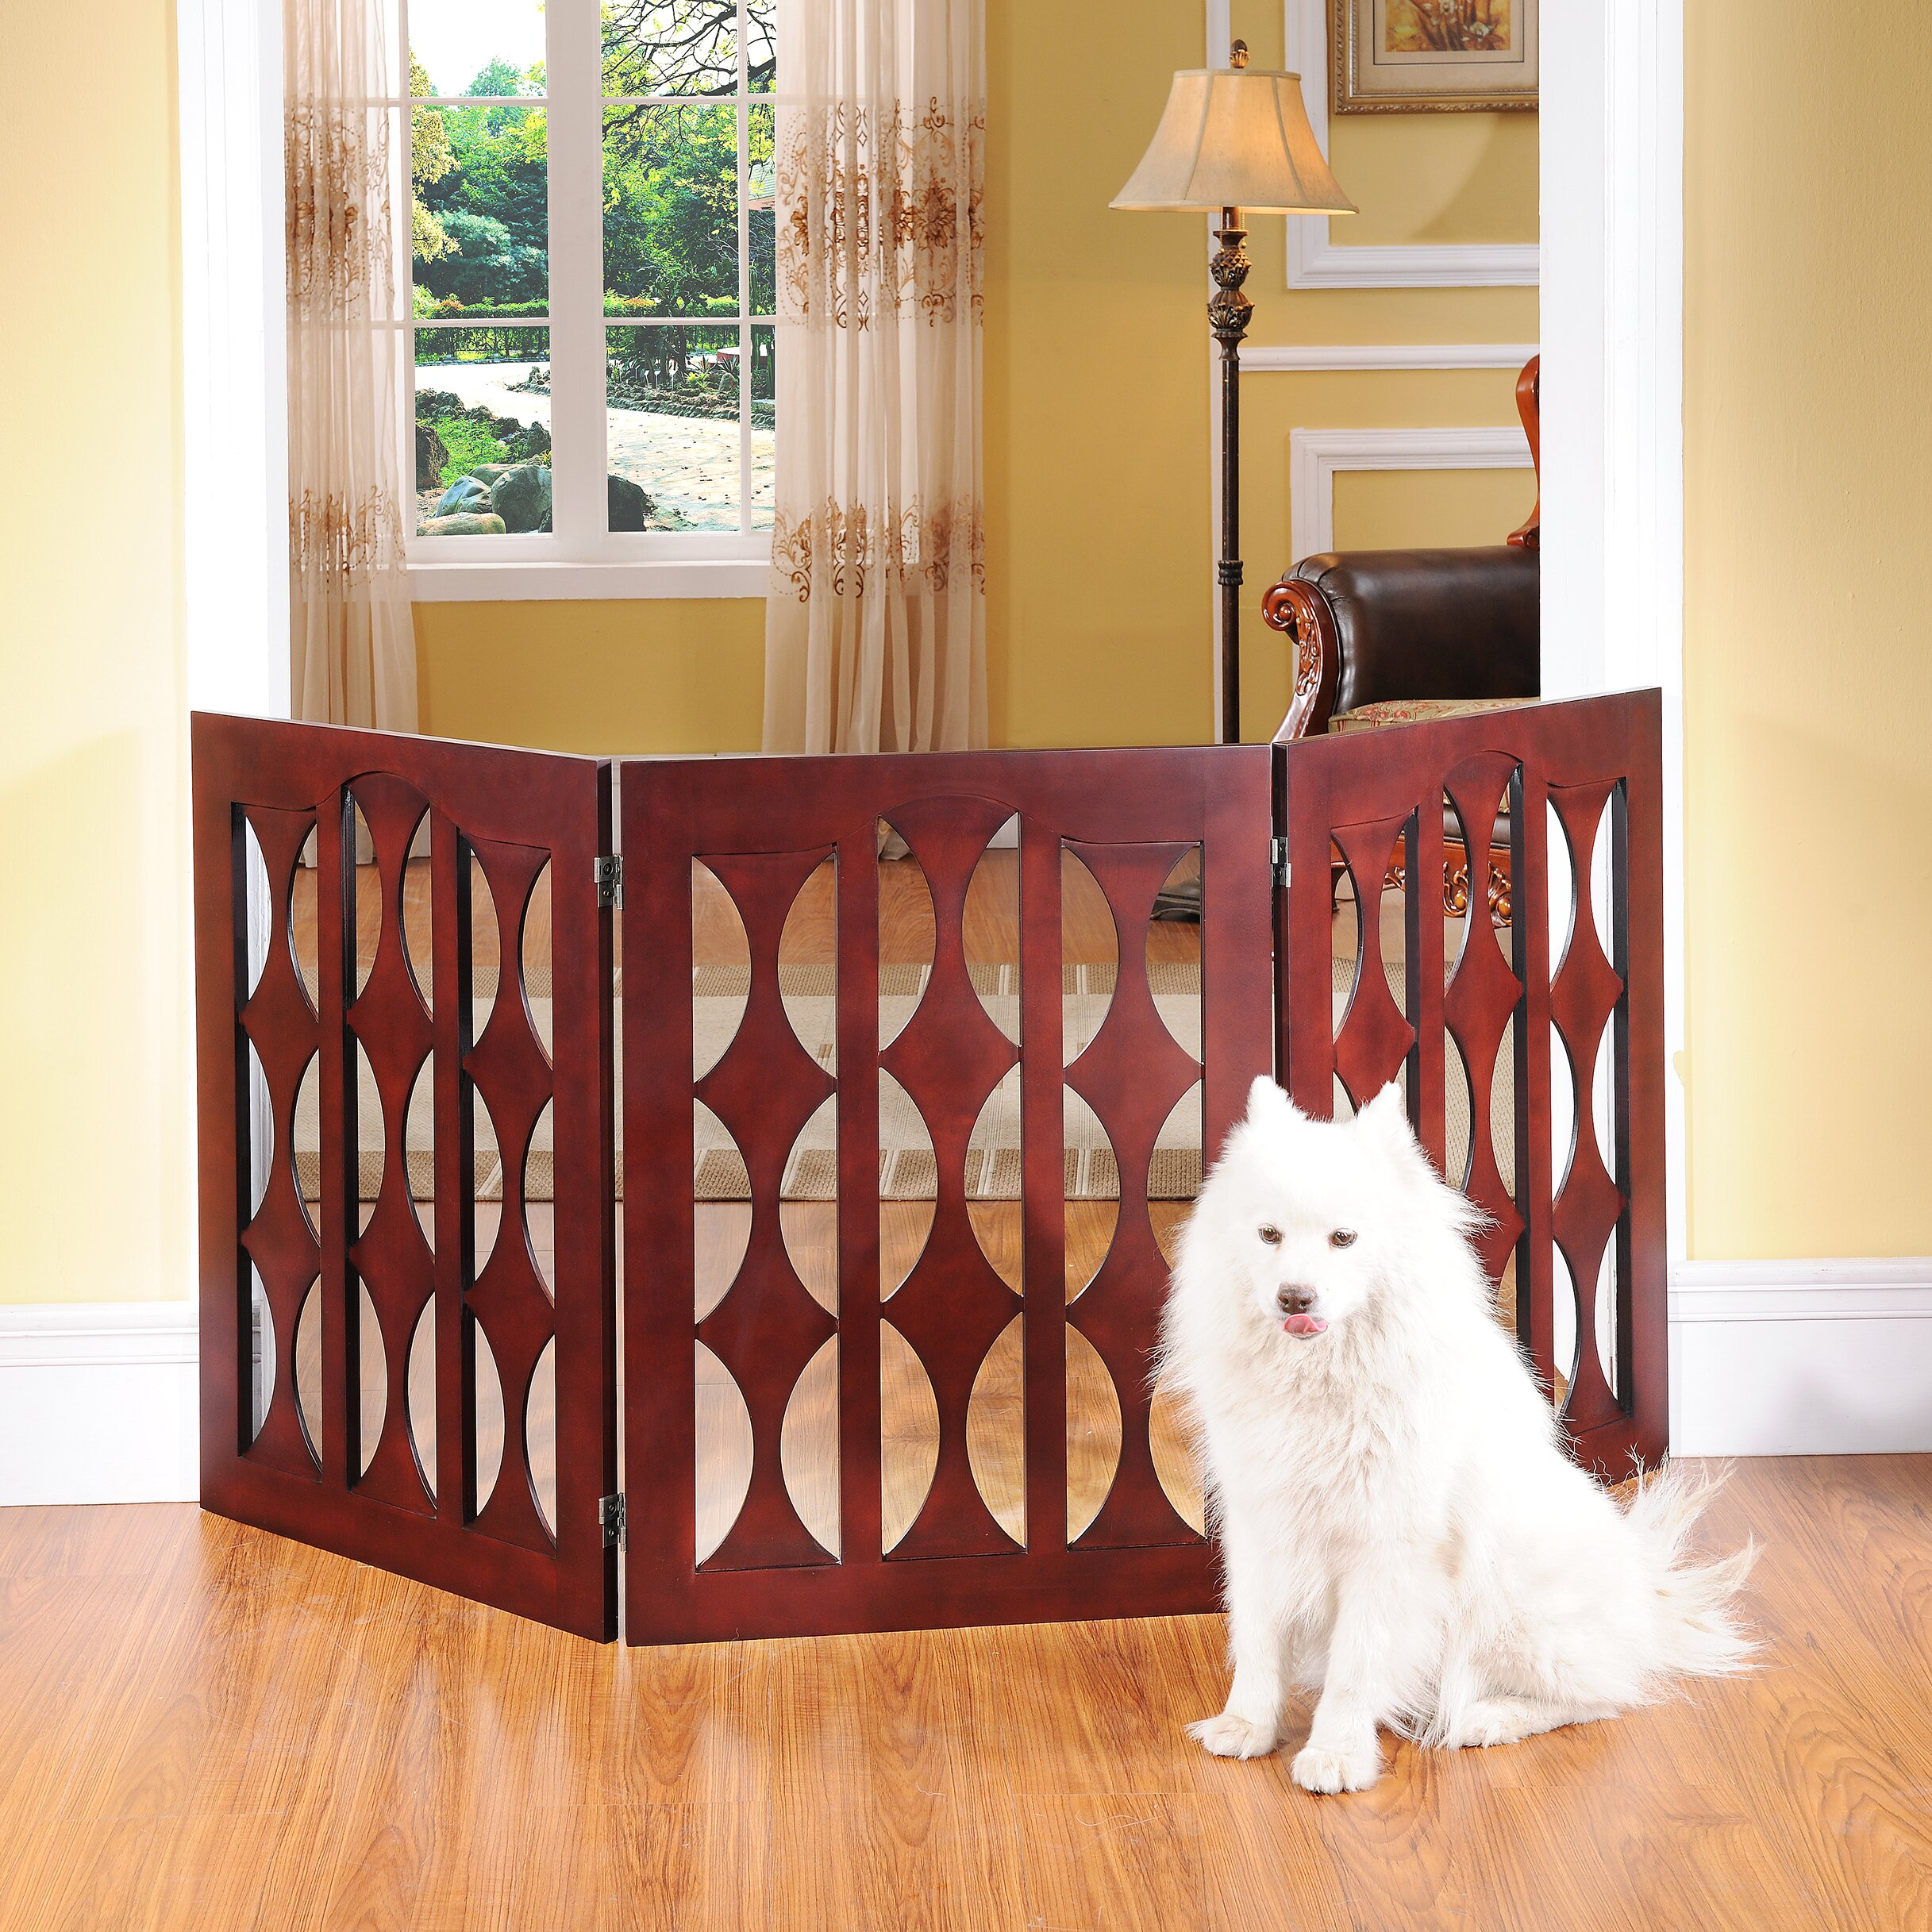 Elegant Home Fashions Gerard Dog Gate. Elegant Home Fashions Gerard Dog Gate   Reviews   Wayfair